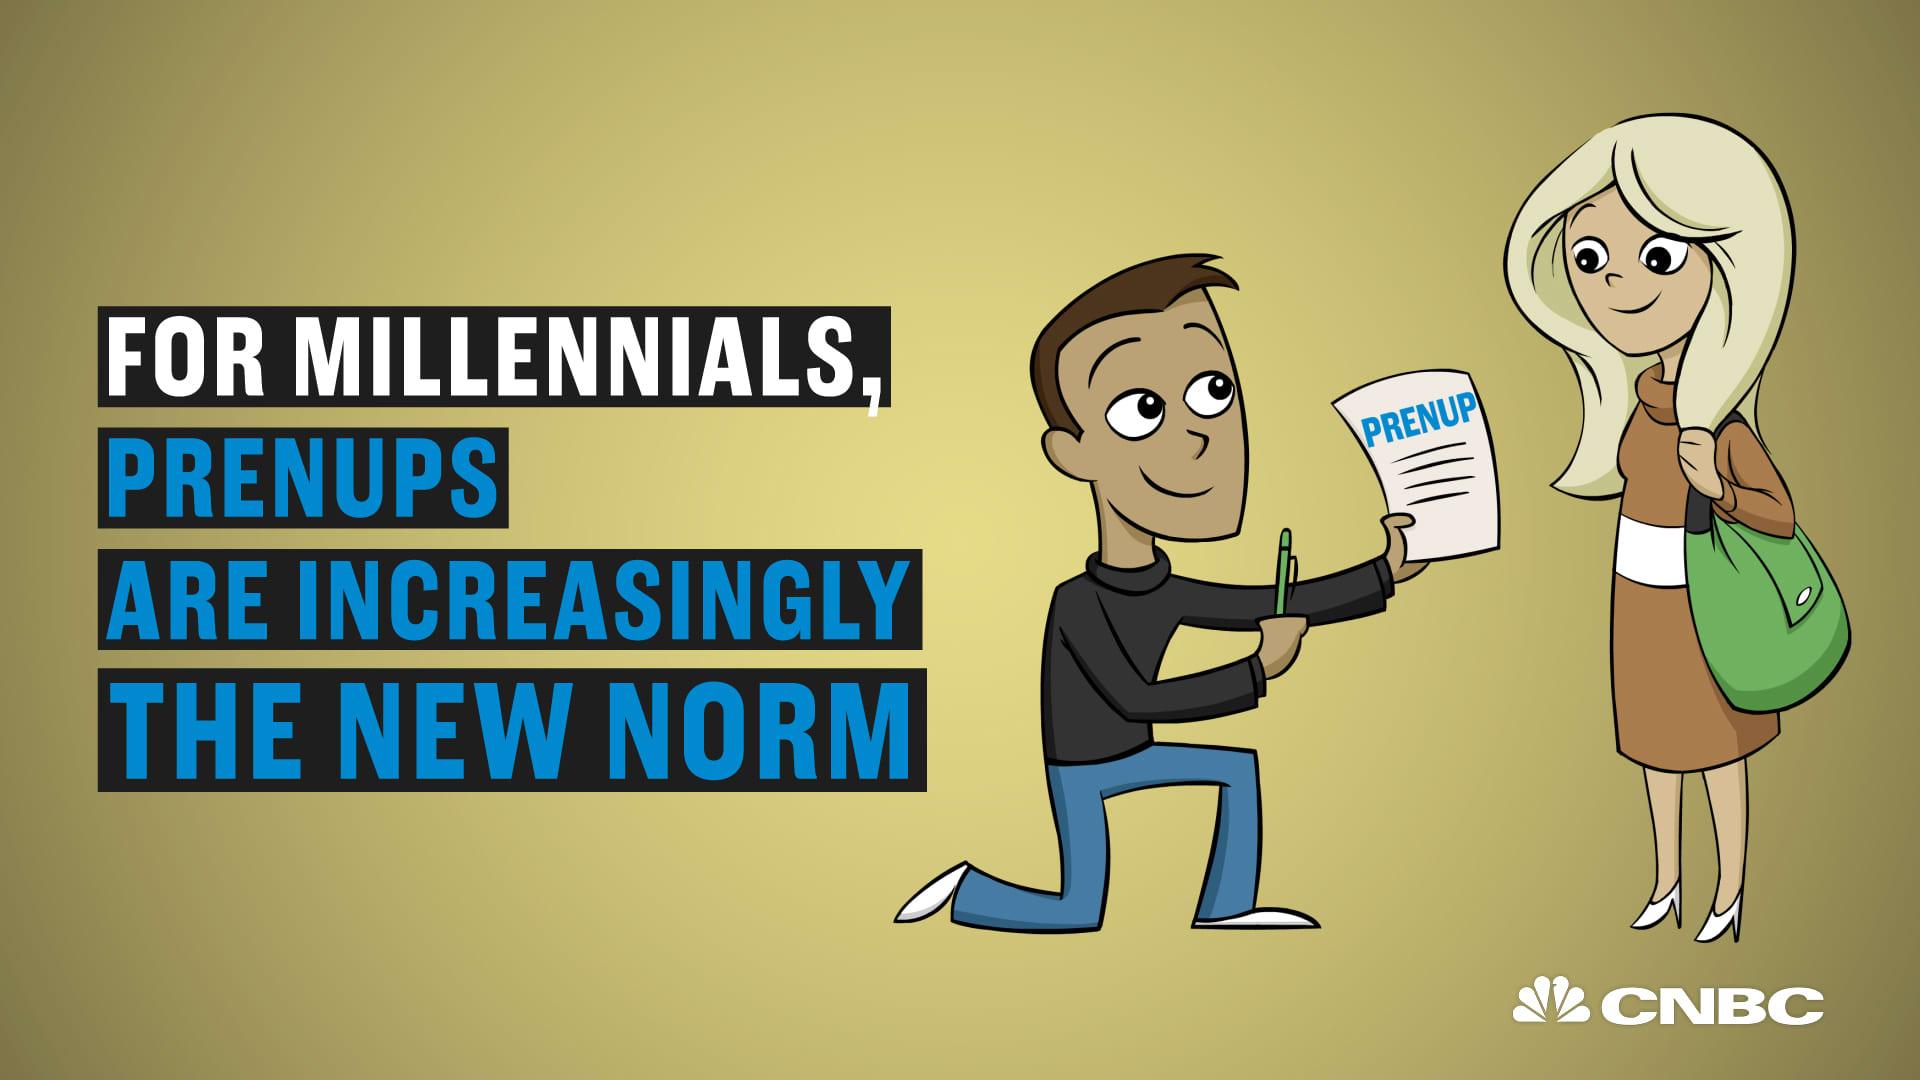 More Millennials Sign Prenups Before Marriage